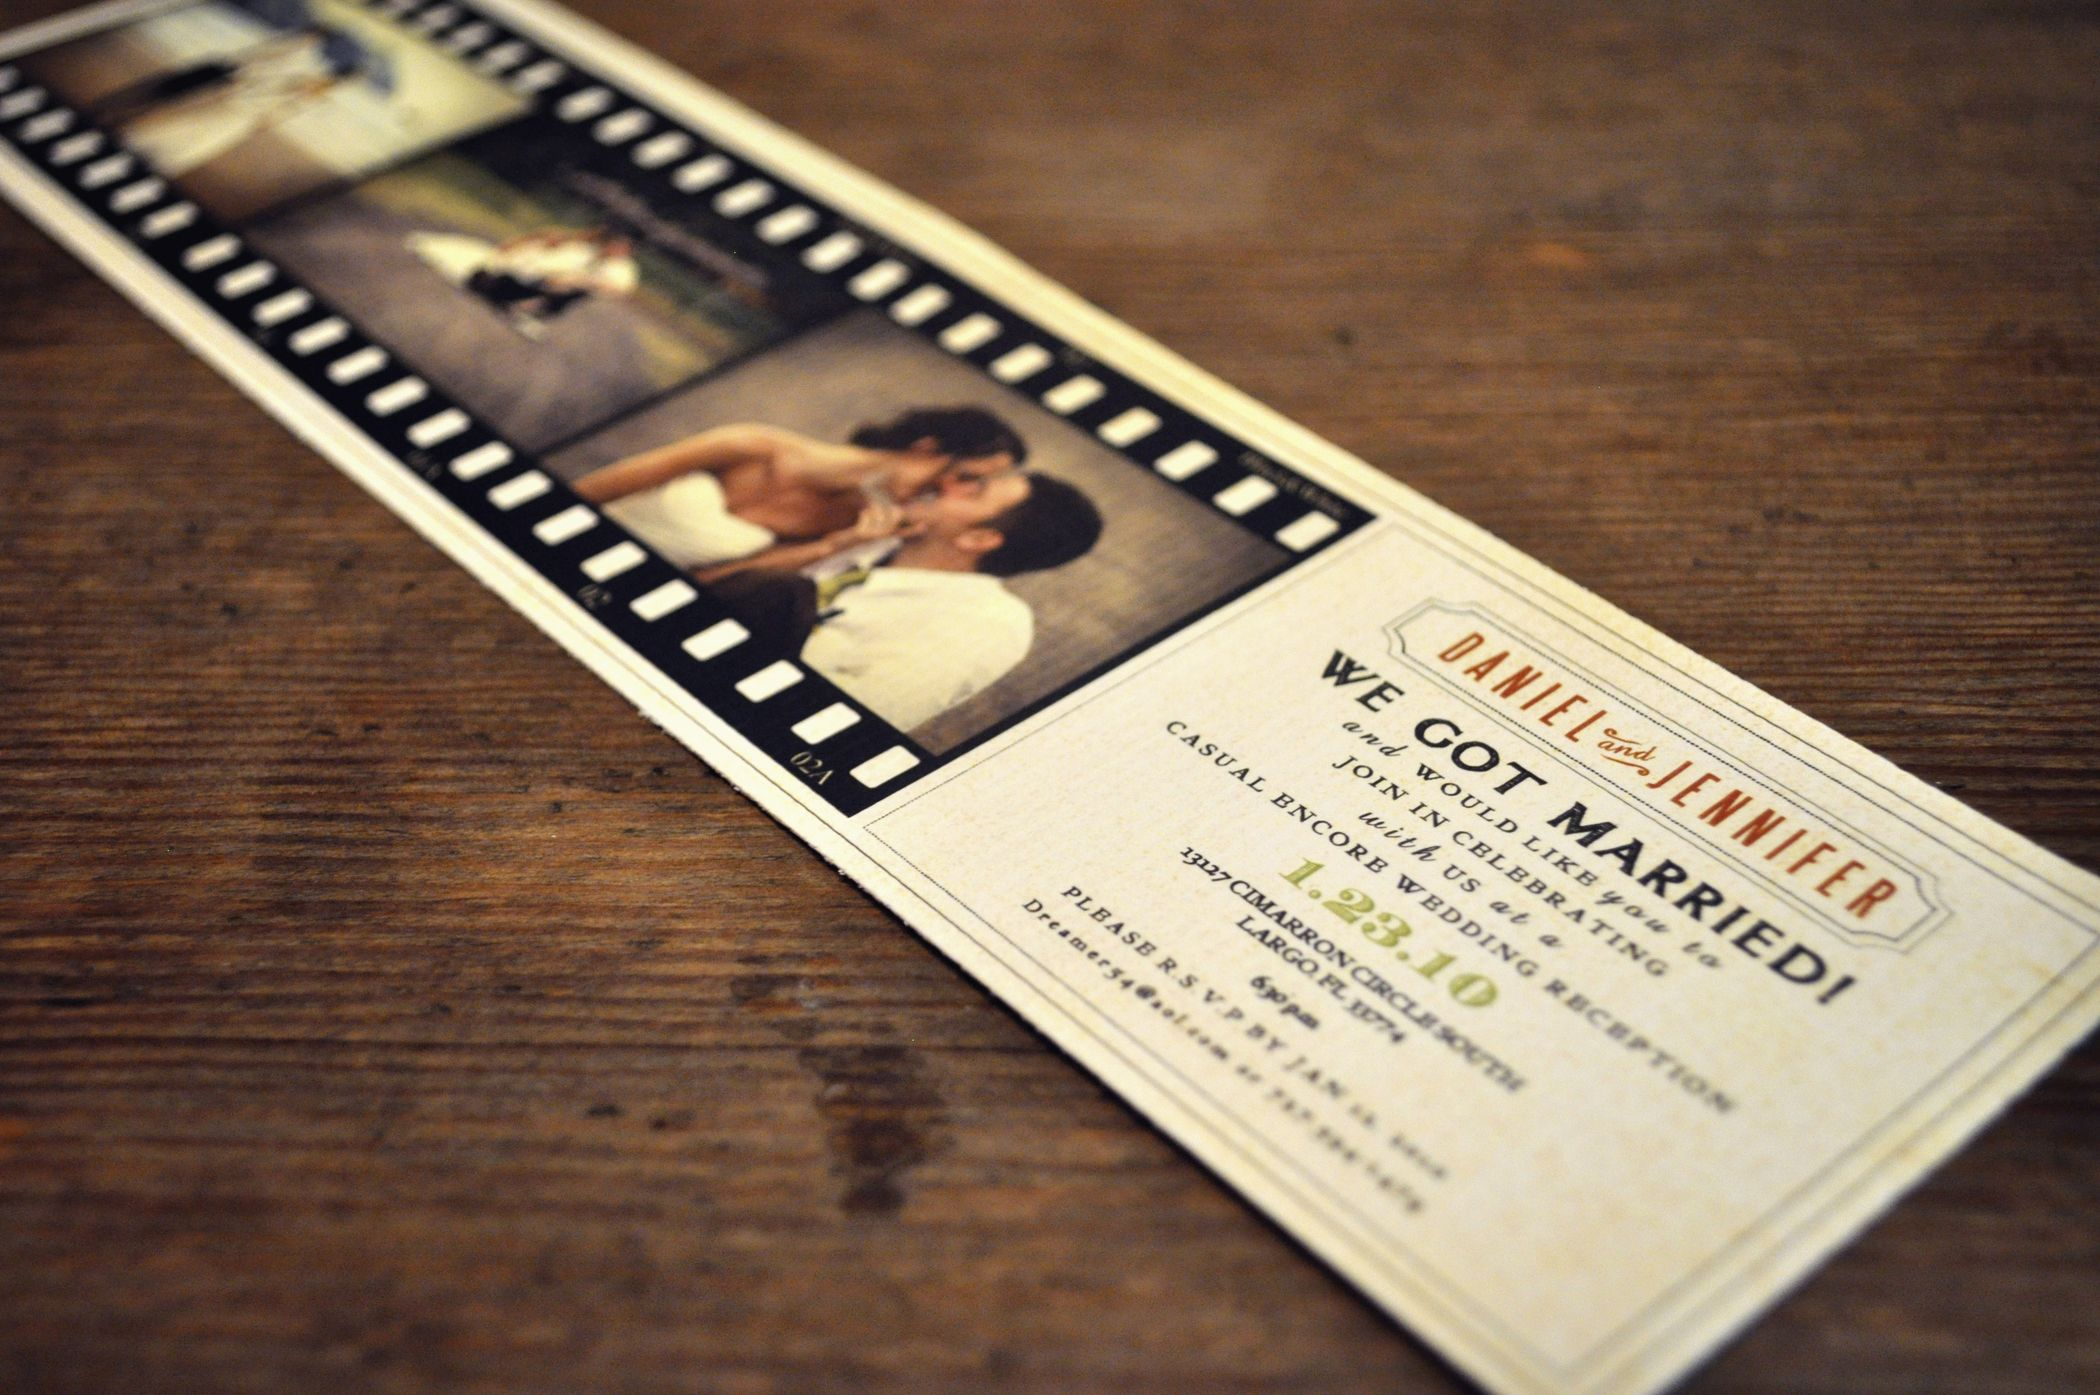 wedding invitationdesigns%0A retro wedding invites   Trouwfotografie  u     Uitnodigingen   Pinterest    Vintage wedding invitations  Vintage weddings and Wedding